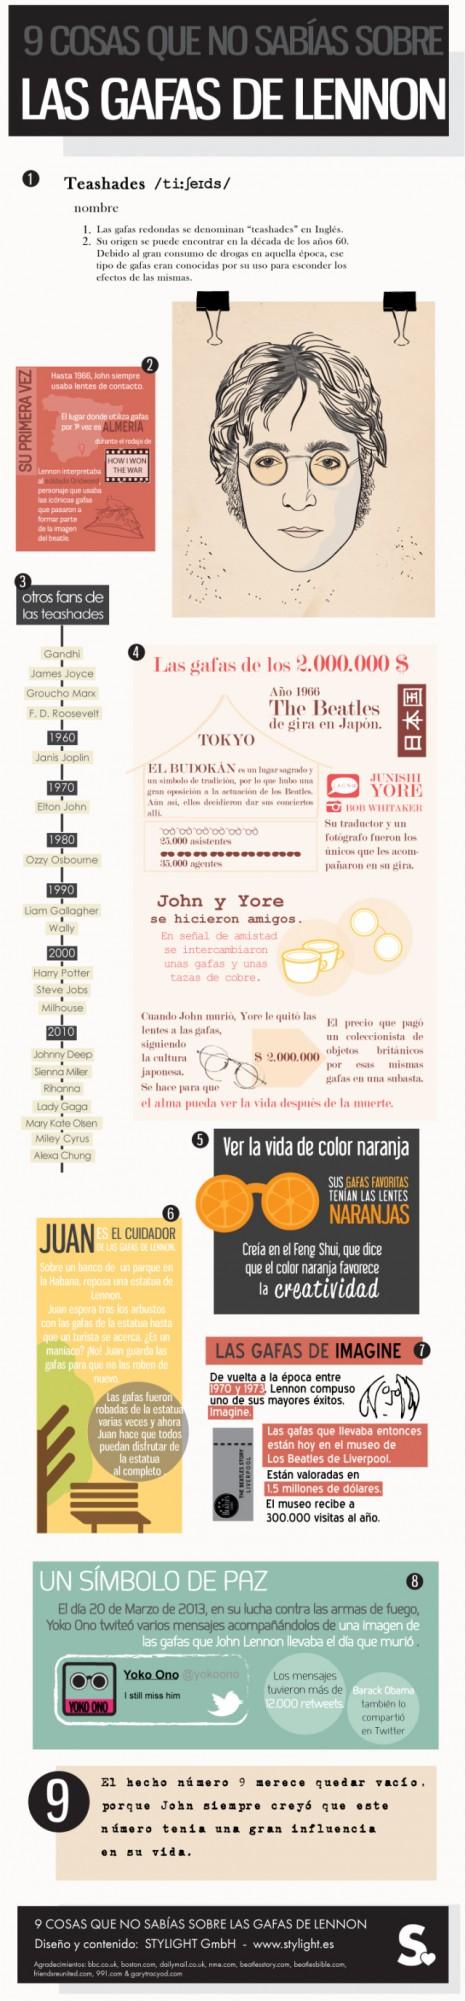 infografia_9_cosas_que_no_sabias_sobre_las_gafas_de_lennon